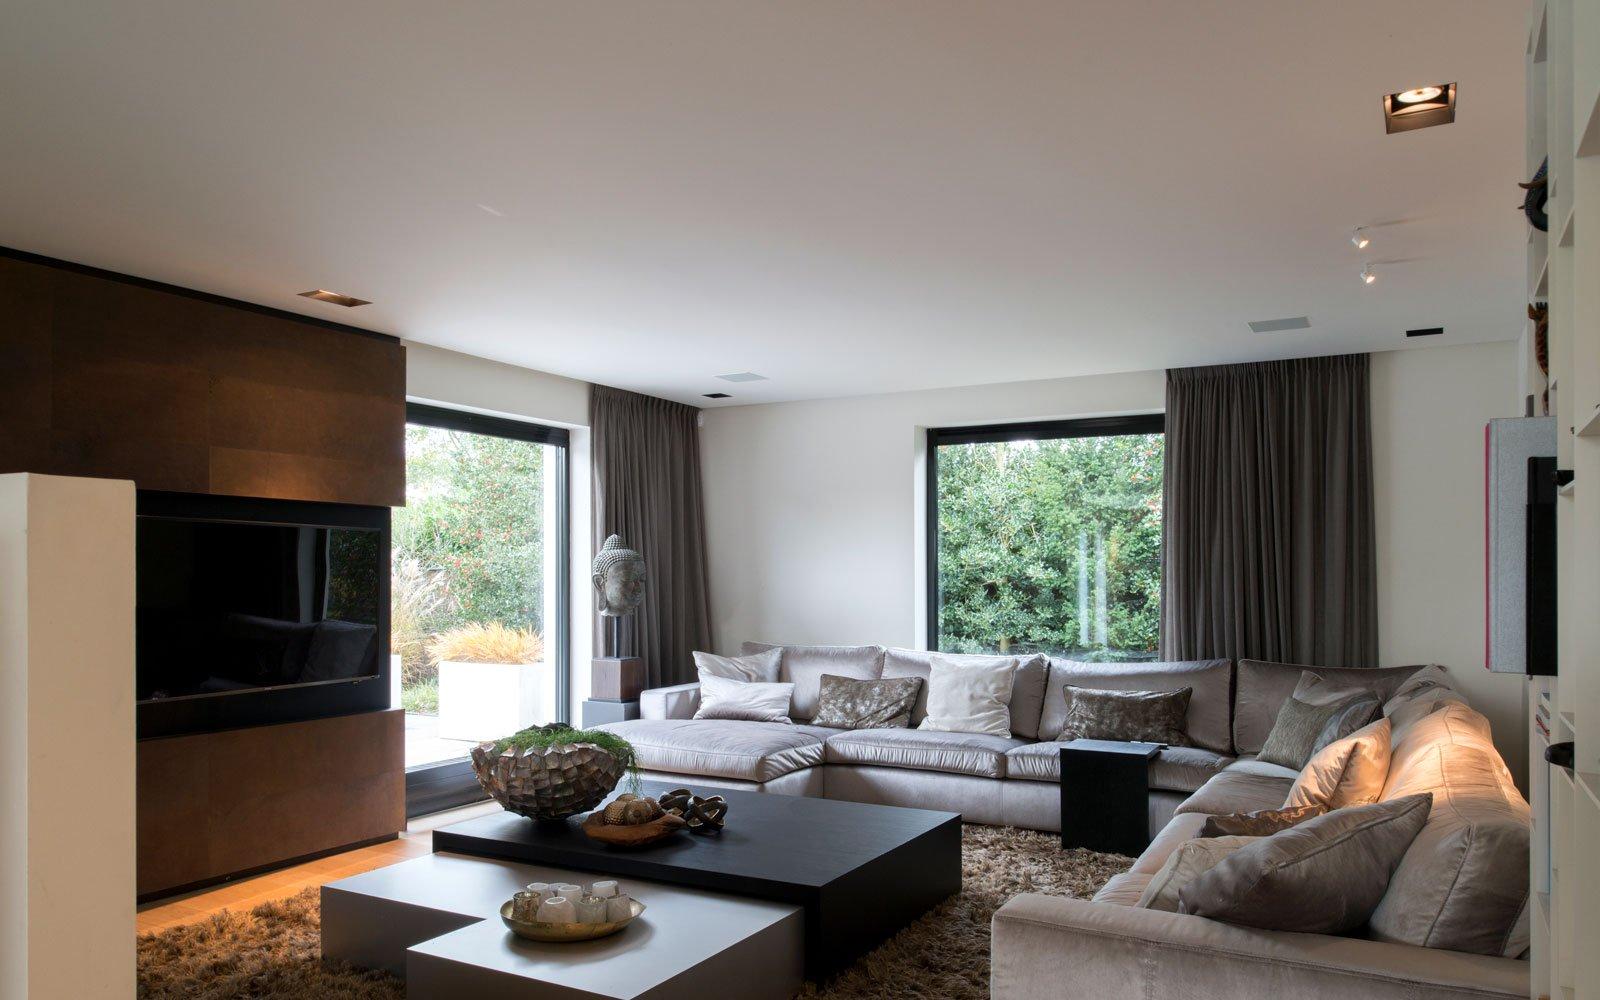 Woonkamer, loungebank, hoekbank, televisie, sfeervol, Eric Kant, meubilair, moderne villa, VVR Architecten